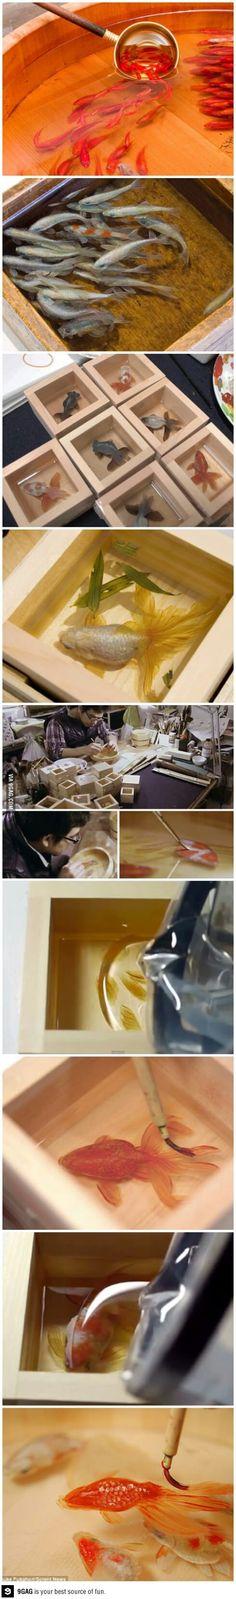 3D Goldfish Paintings by Japanese Artist, Riusuke Fukahori